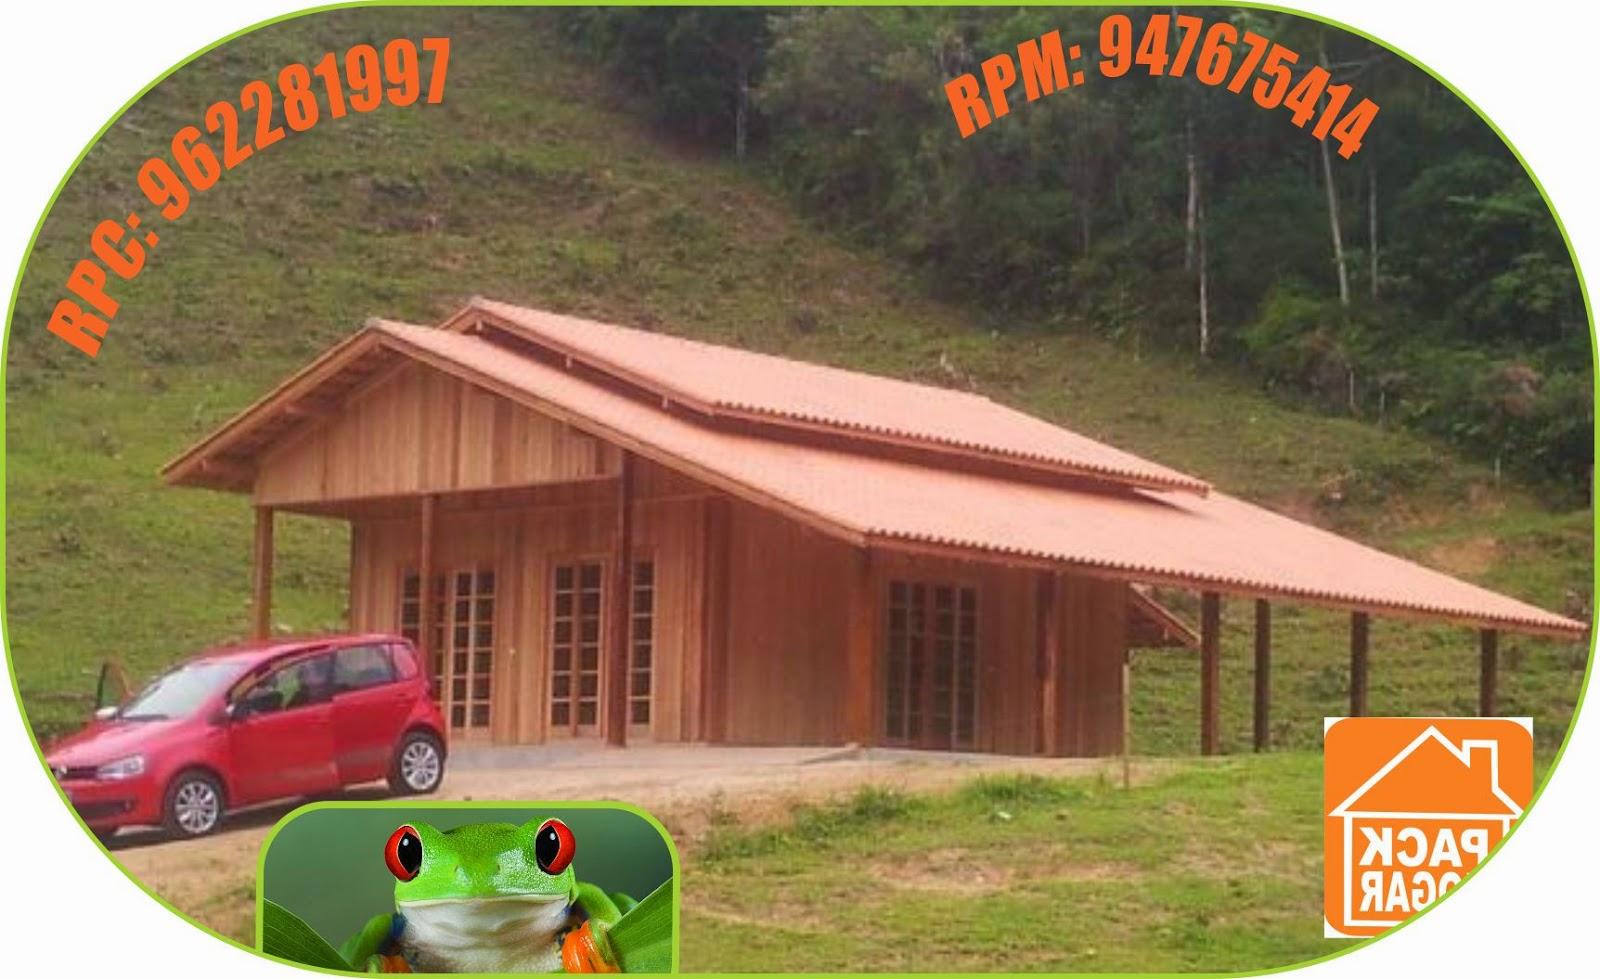 Caba as bungalows de madera bambu drywall para clubes - Bungalows de madera prefabricadas precios ...